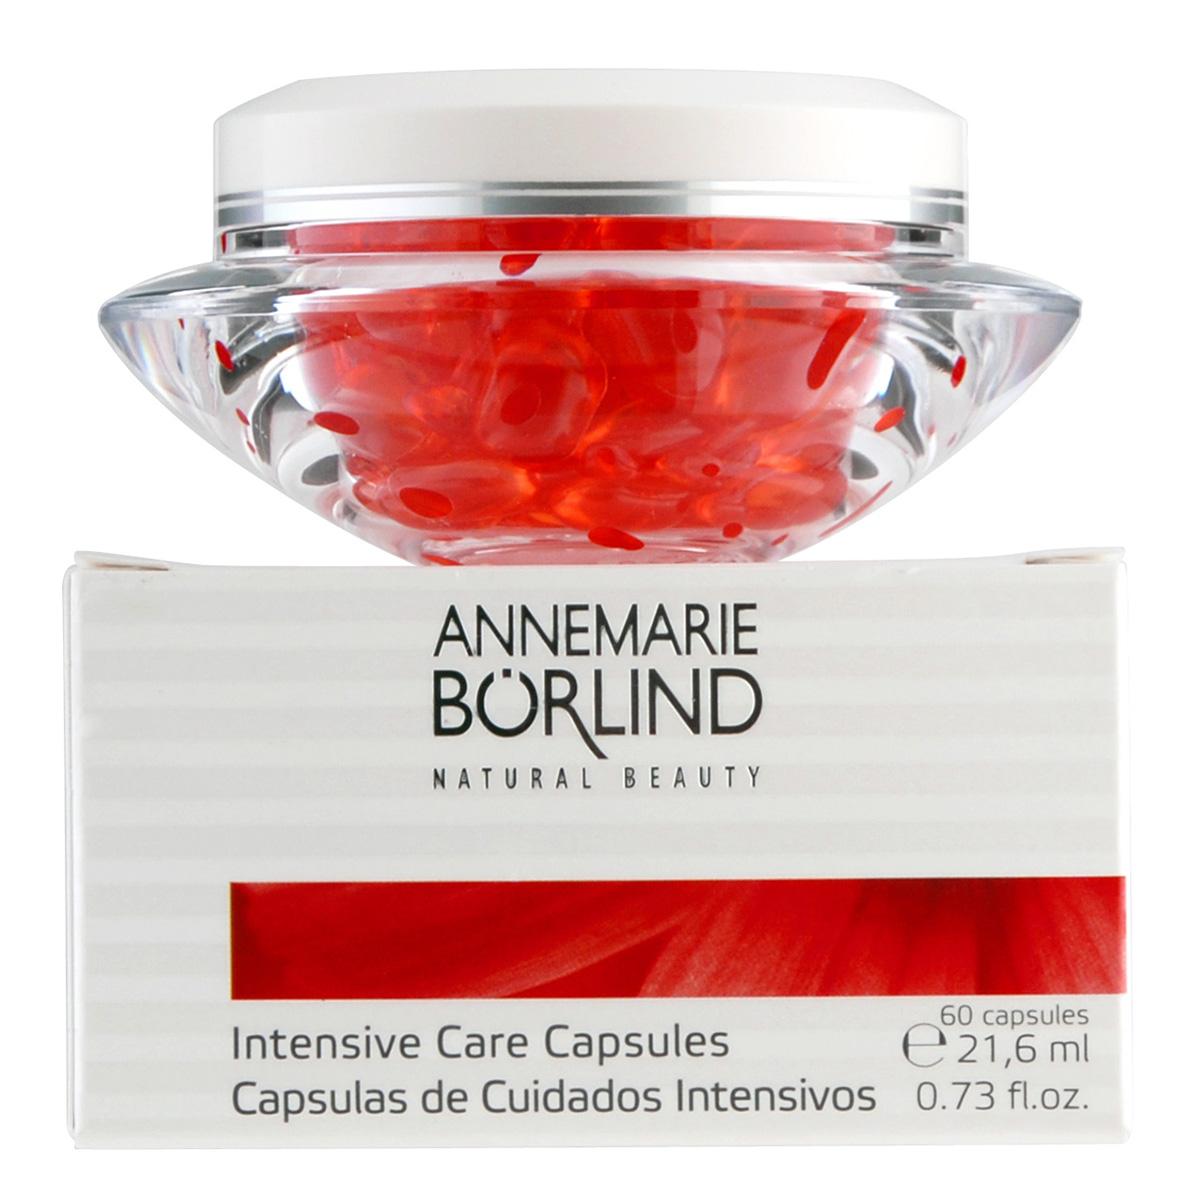 Annemarie Borlind  Intensive Care Capsules (For All Skins) 0.73oz, 21.6ml